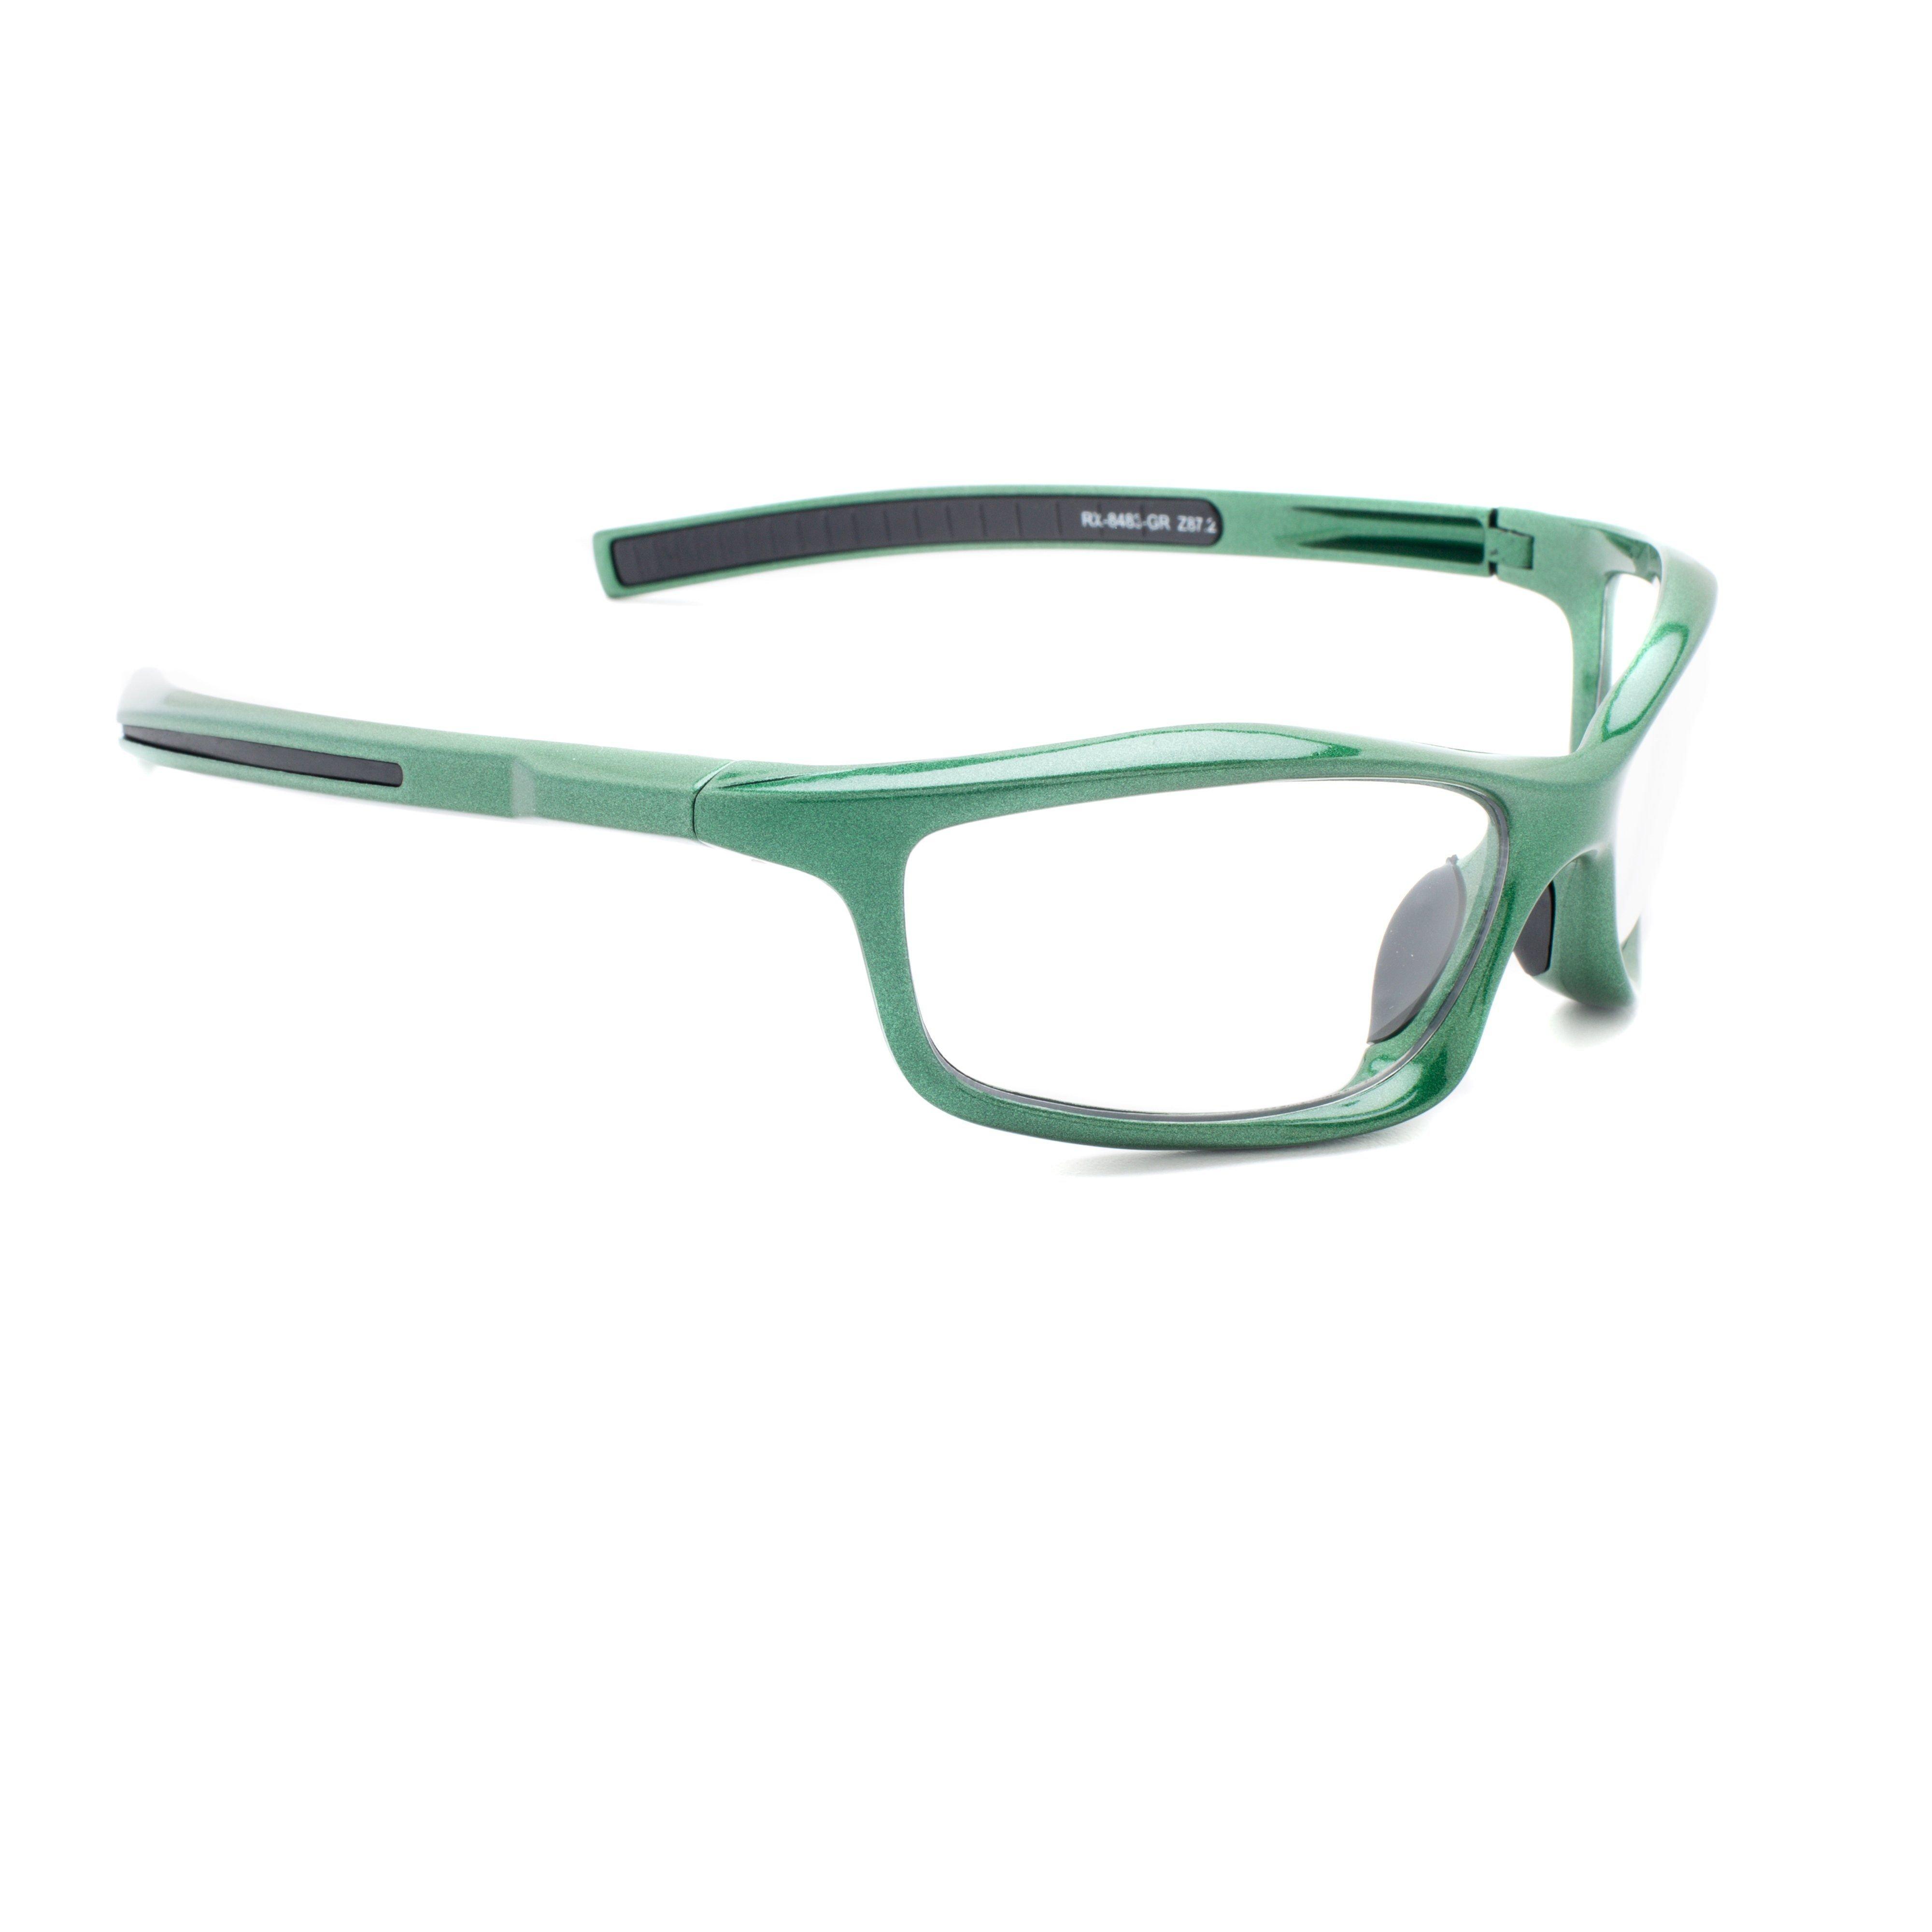 57cfa4b916f6 Buy Prescription Safety Glasses RX-8483 - Rx Safety